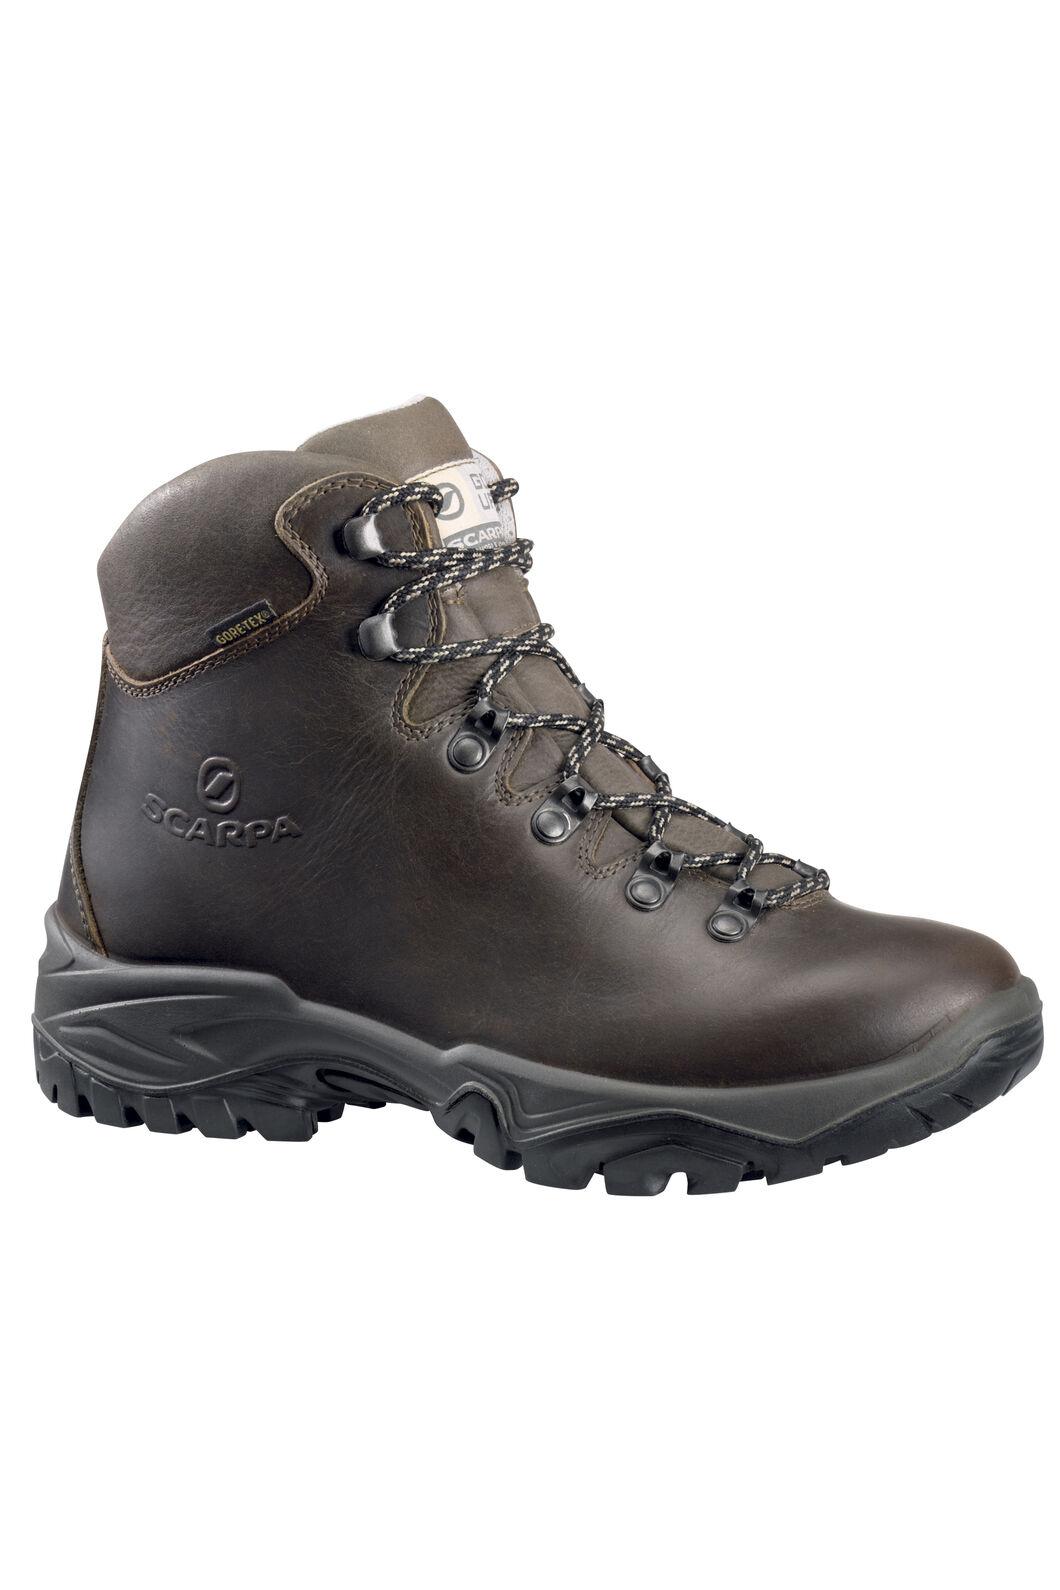 Scarpa Terra GTX Boots - Men's, Brown, hi-res